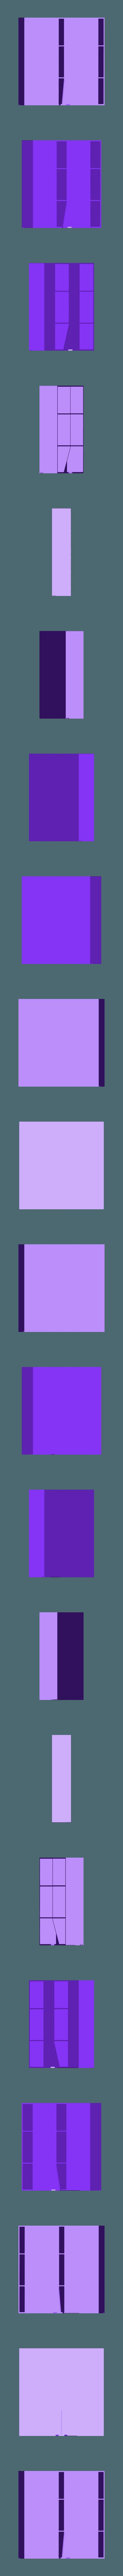 Cajon separador.stl Download STL file Modular desktop organizer • 3D printing design, LnZProd